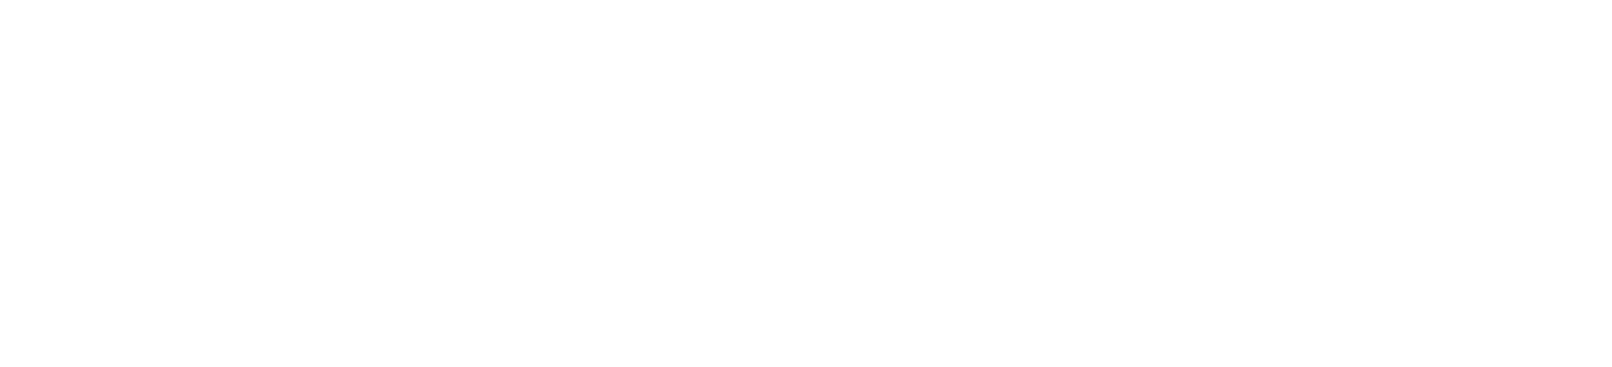 Deutsch-Chinesische Gesellschaft for Medizin e.V.